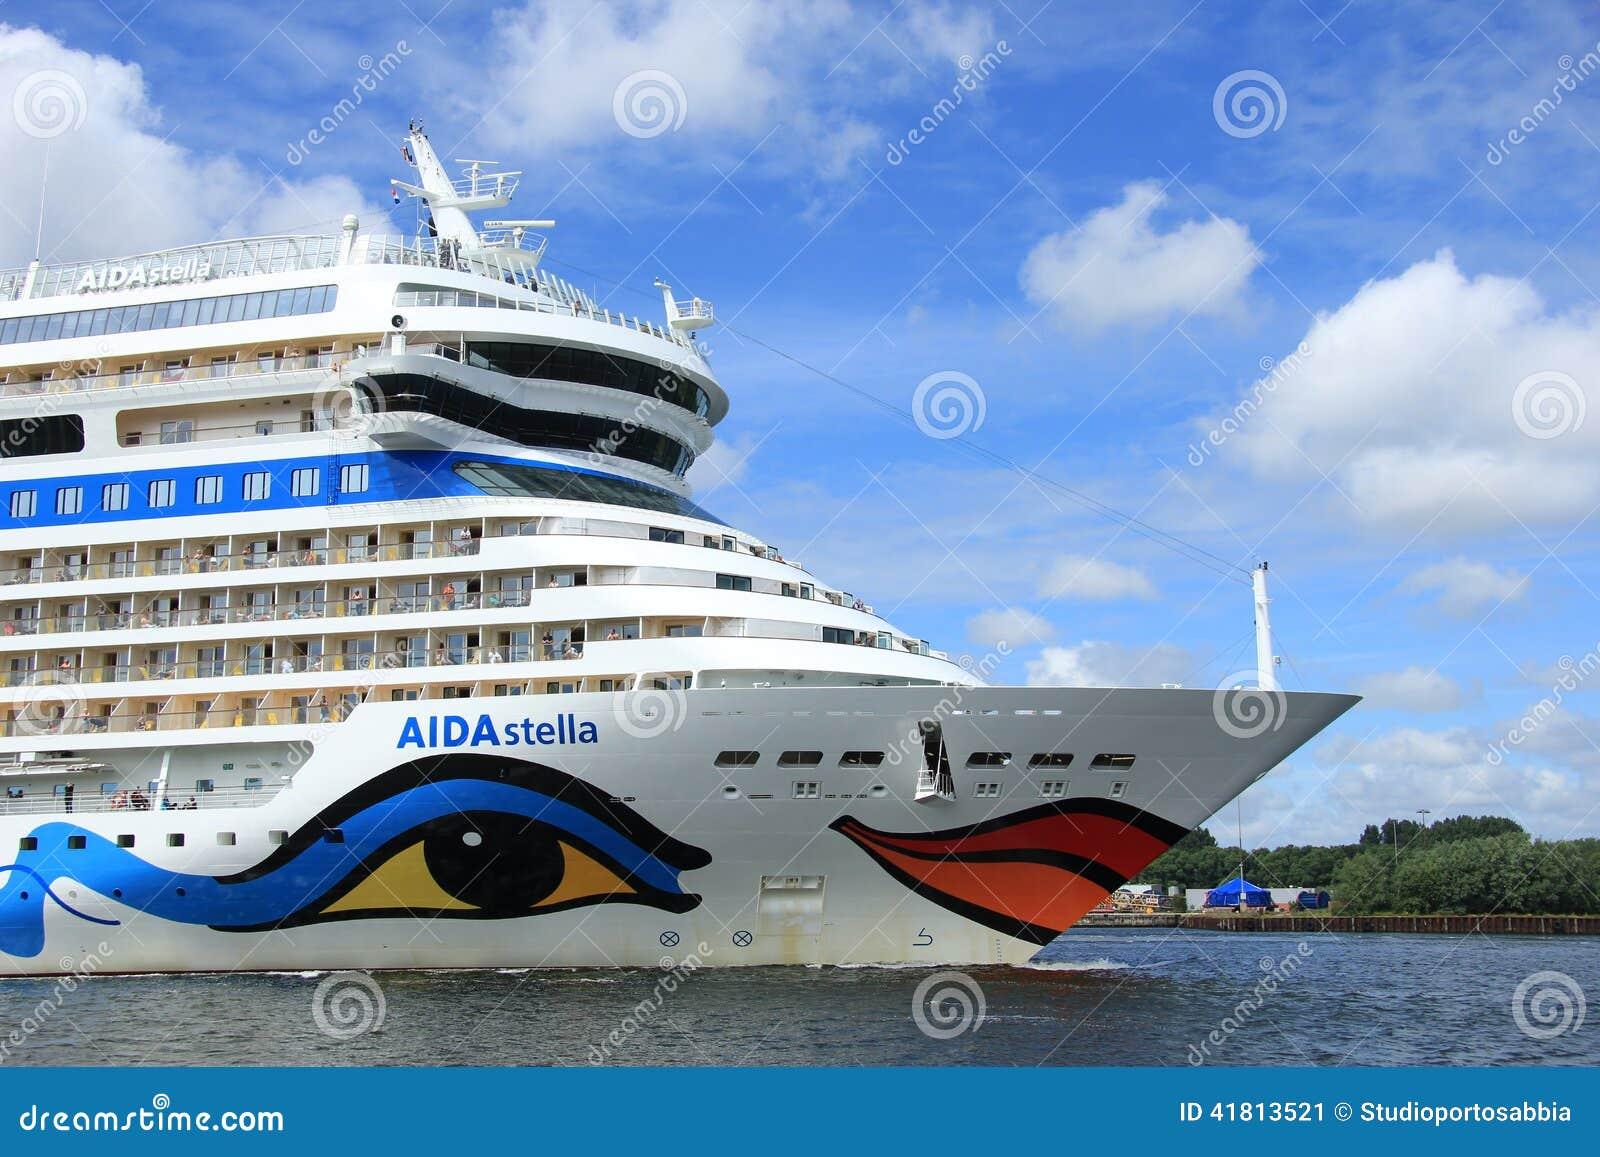 June 22nd, 2014. Velsen; the Netherlands: Aida Stella on North S